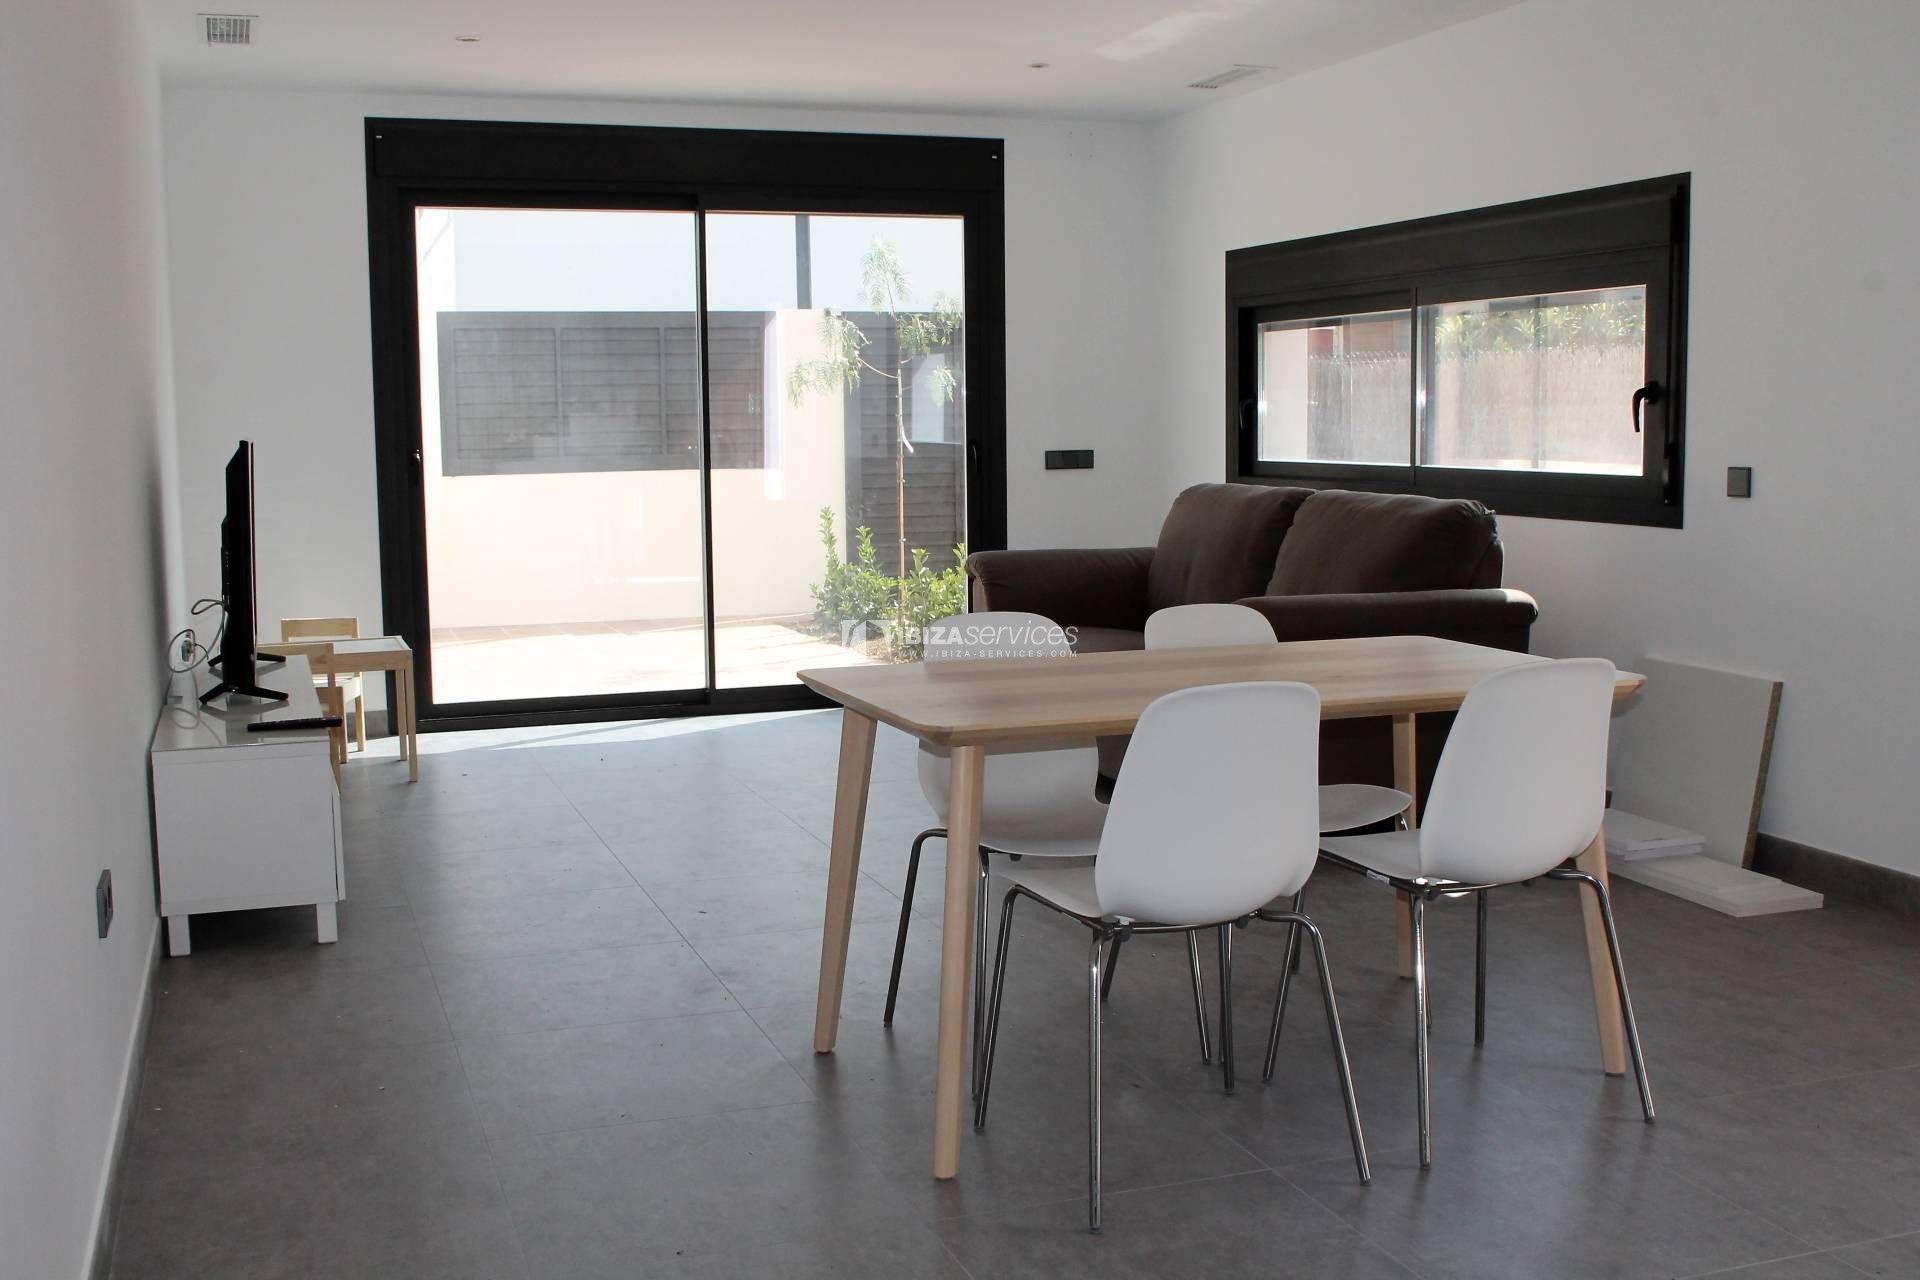 Puig Den Valls Nueva Casa De 3 Dormitorios En Alquiler Para Una Empresa Renting A House 3 Bedroom House Cheap Houses